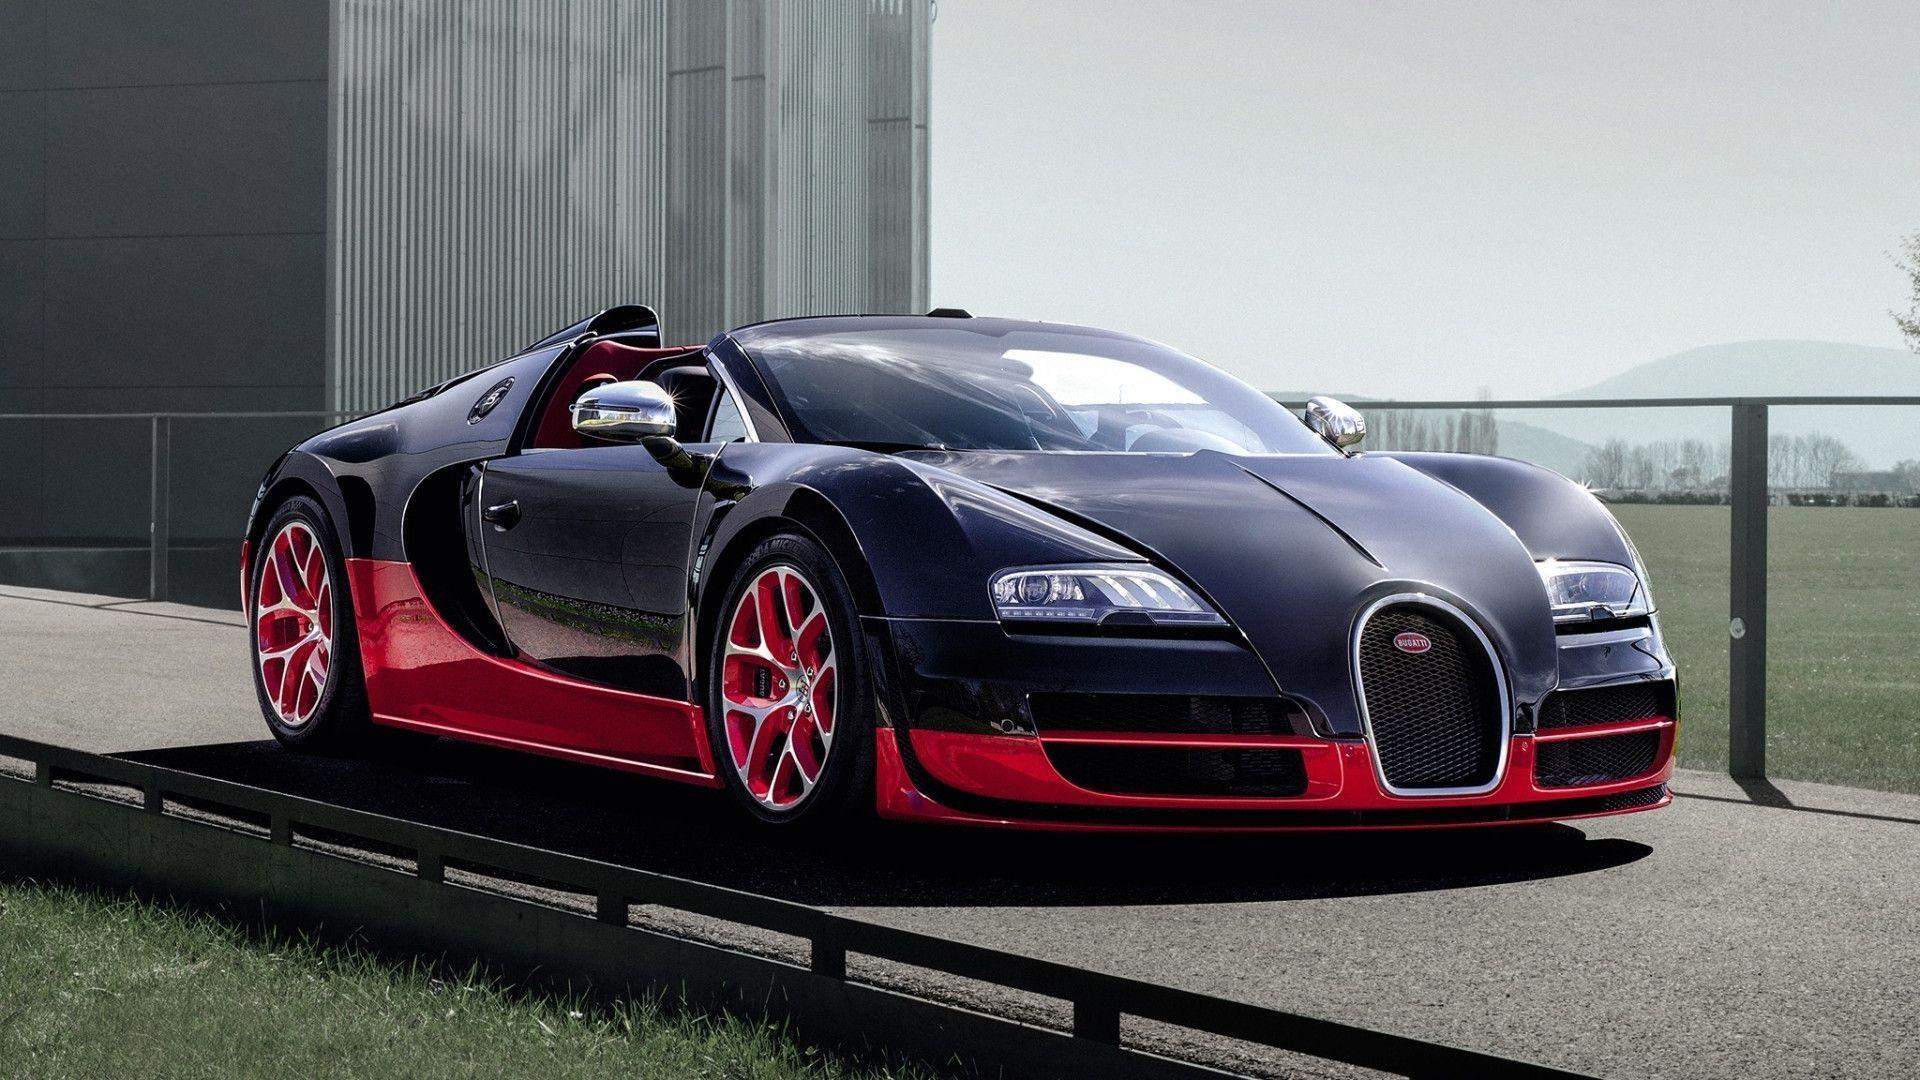 Bugatti Veyron Super Sport Wallpapers - Wallpaper Cave